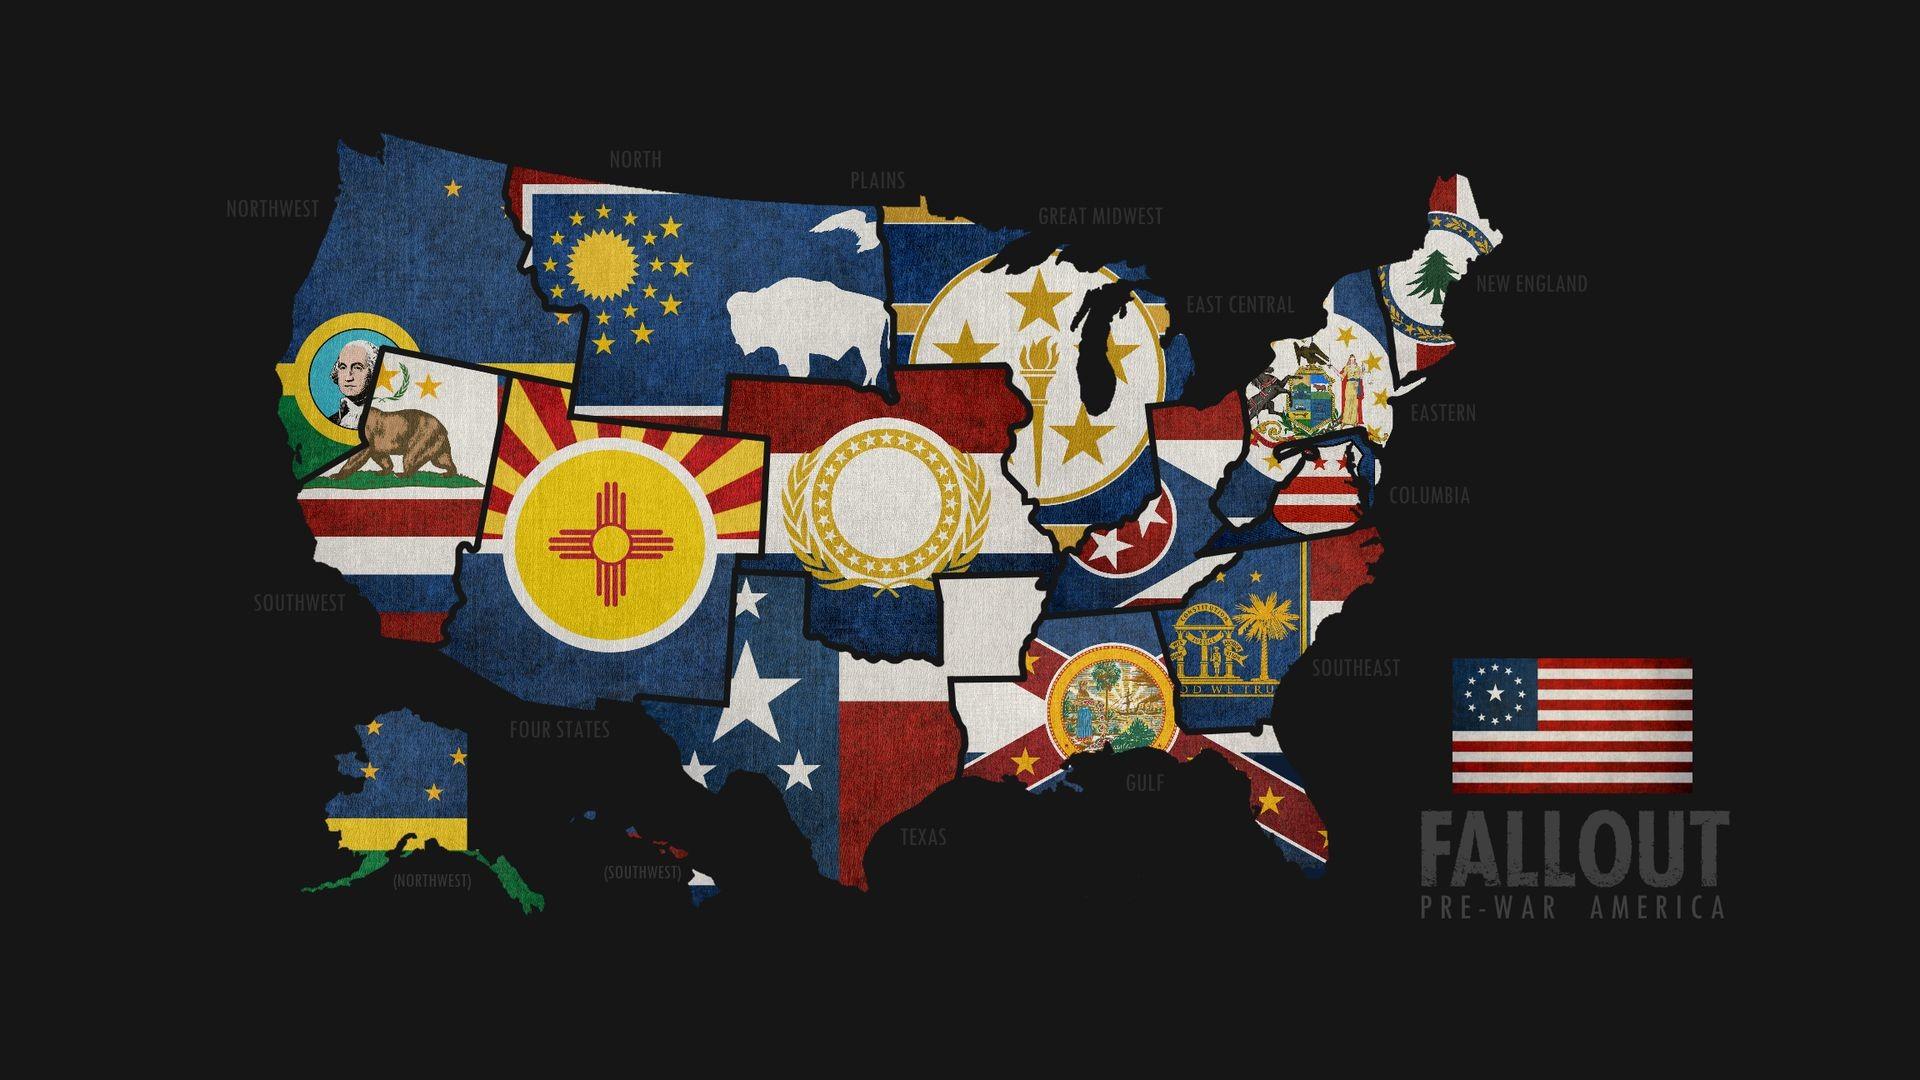 Res: 1920x1080, Fallout Pre War America wallpaper